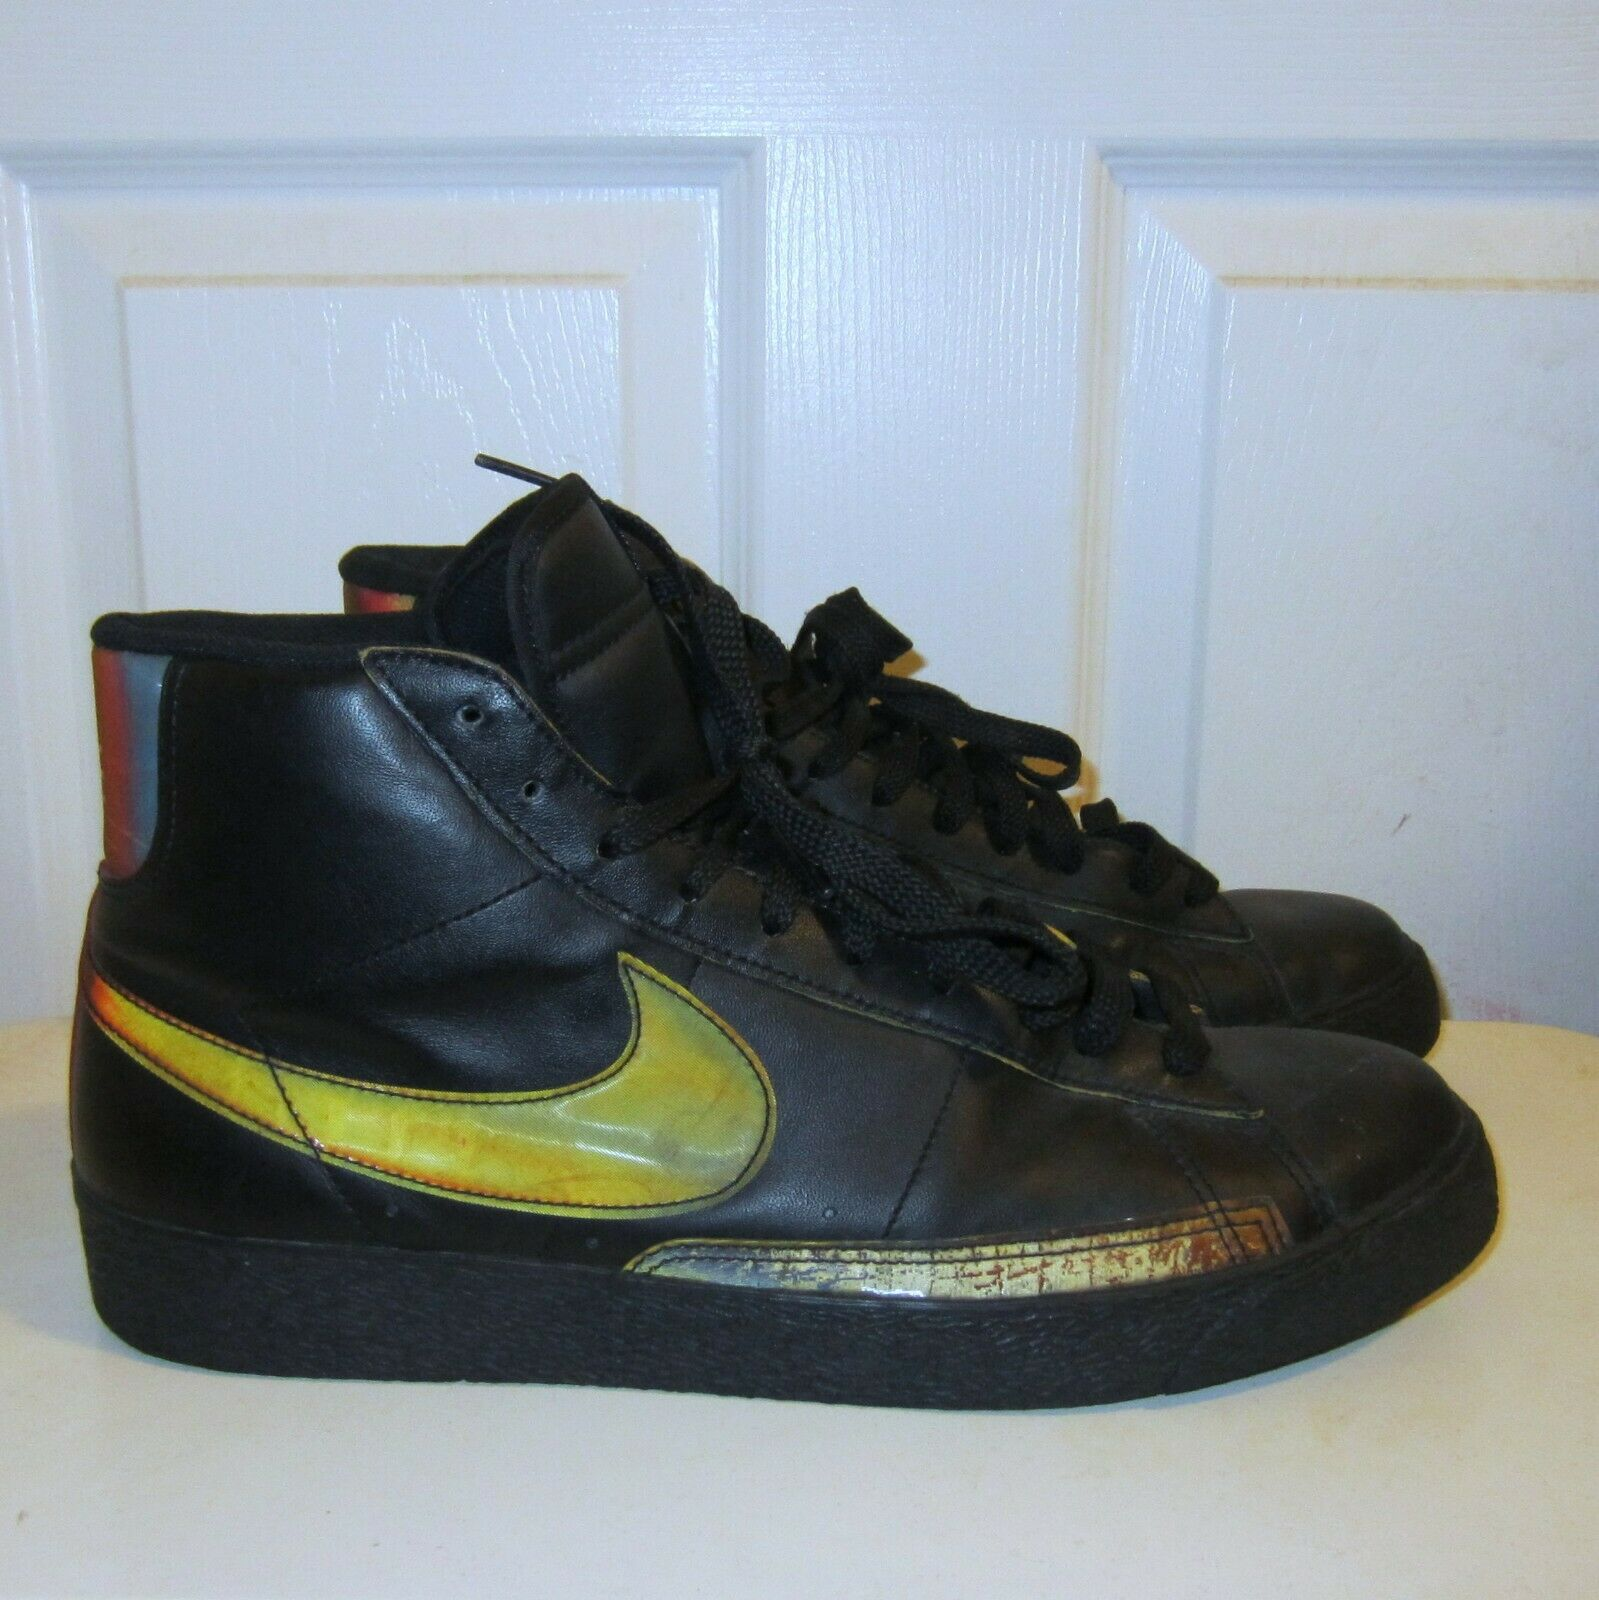 "Nike Black Blazer Hi Premium ""Playstation 3"" Mens Sneaker shoes Sz 11 Defect"